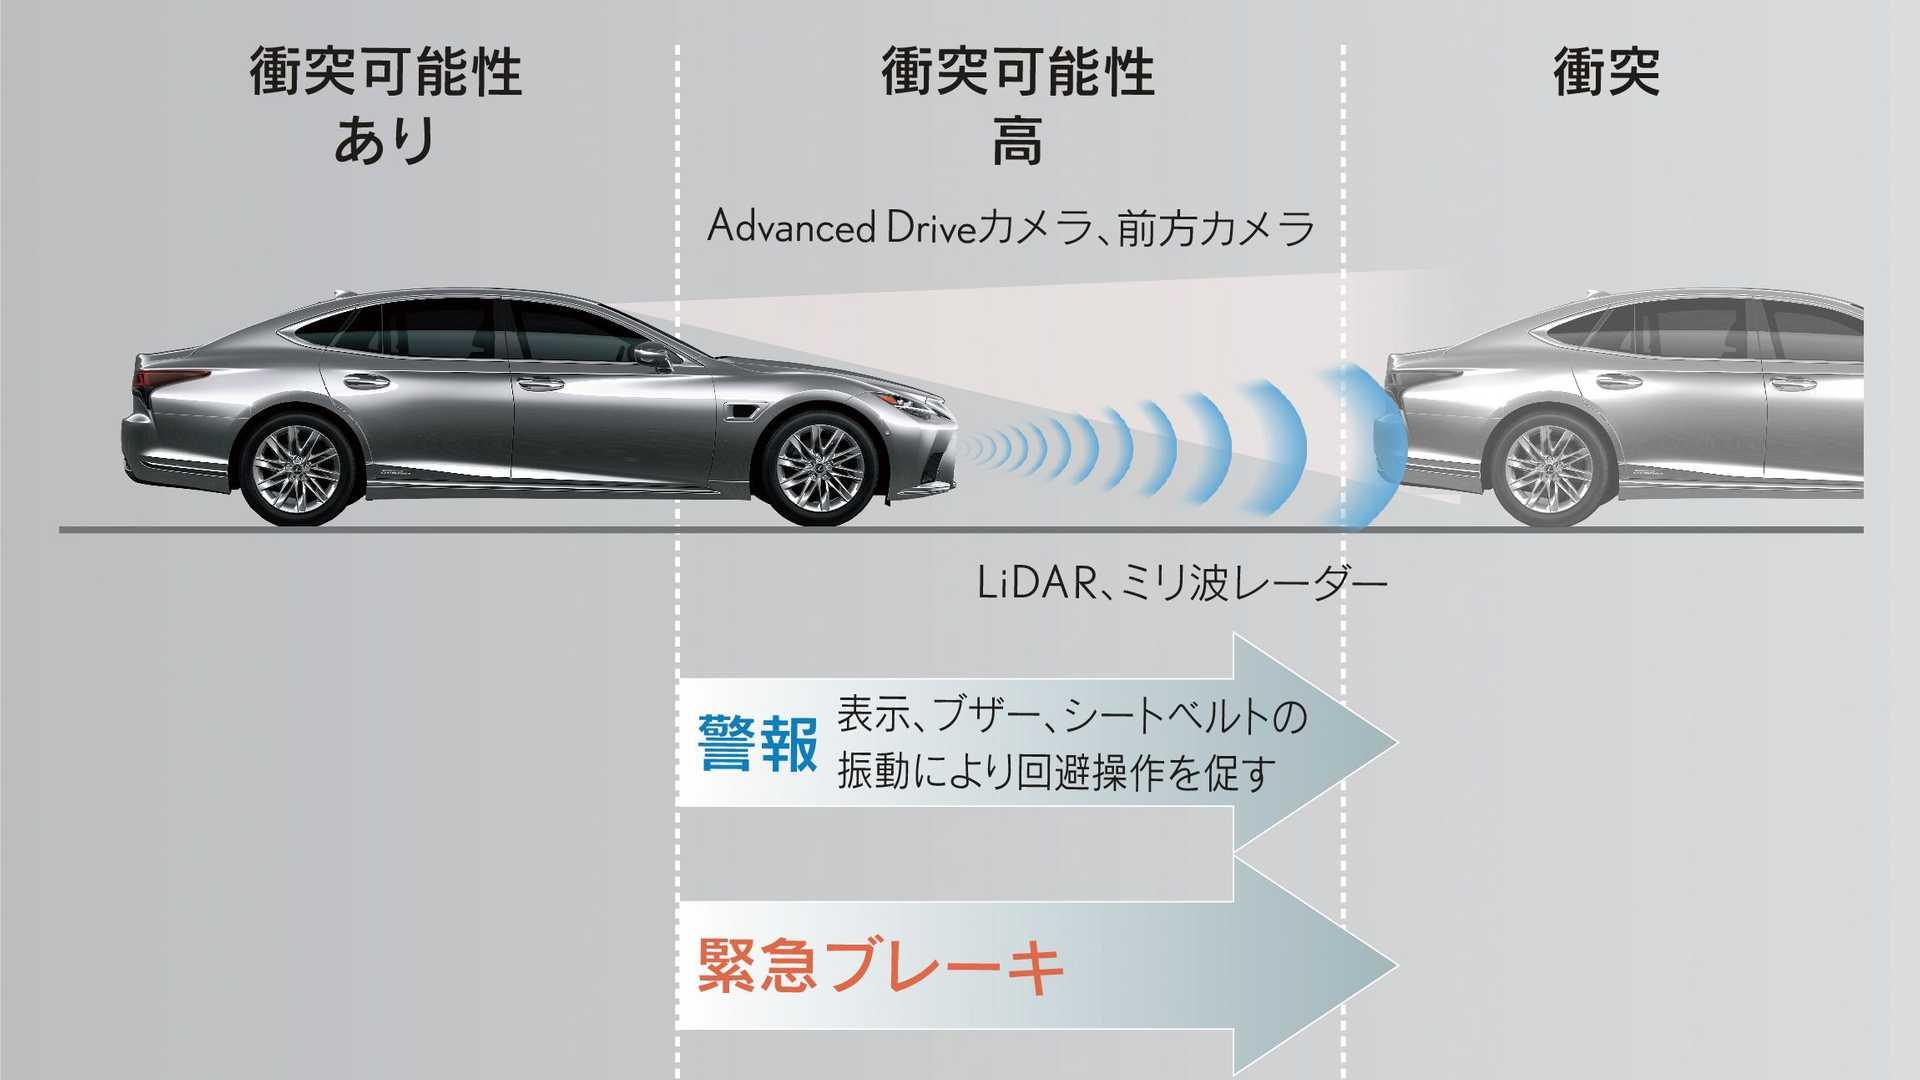 Lexus-LS-And-Toyota-Mirai-Advanced-Drive-36